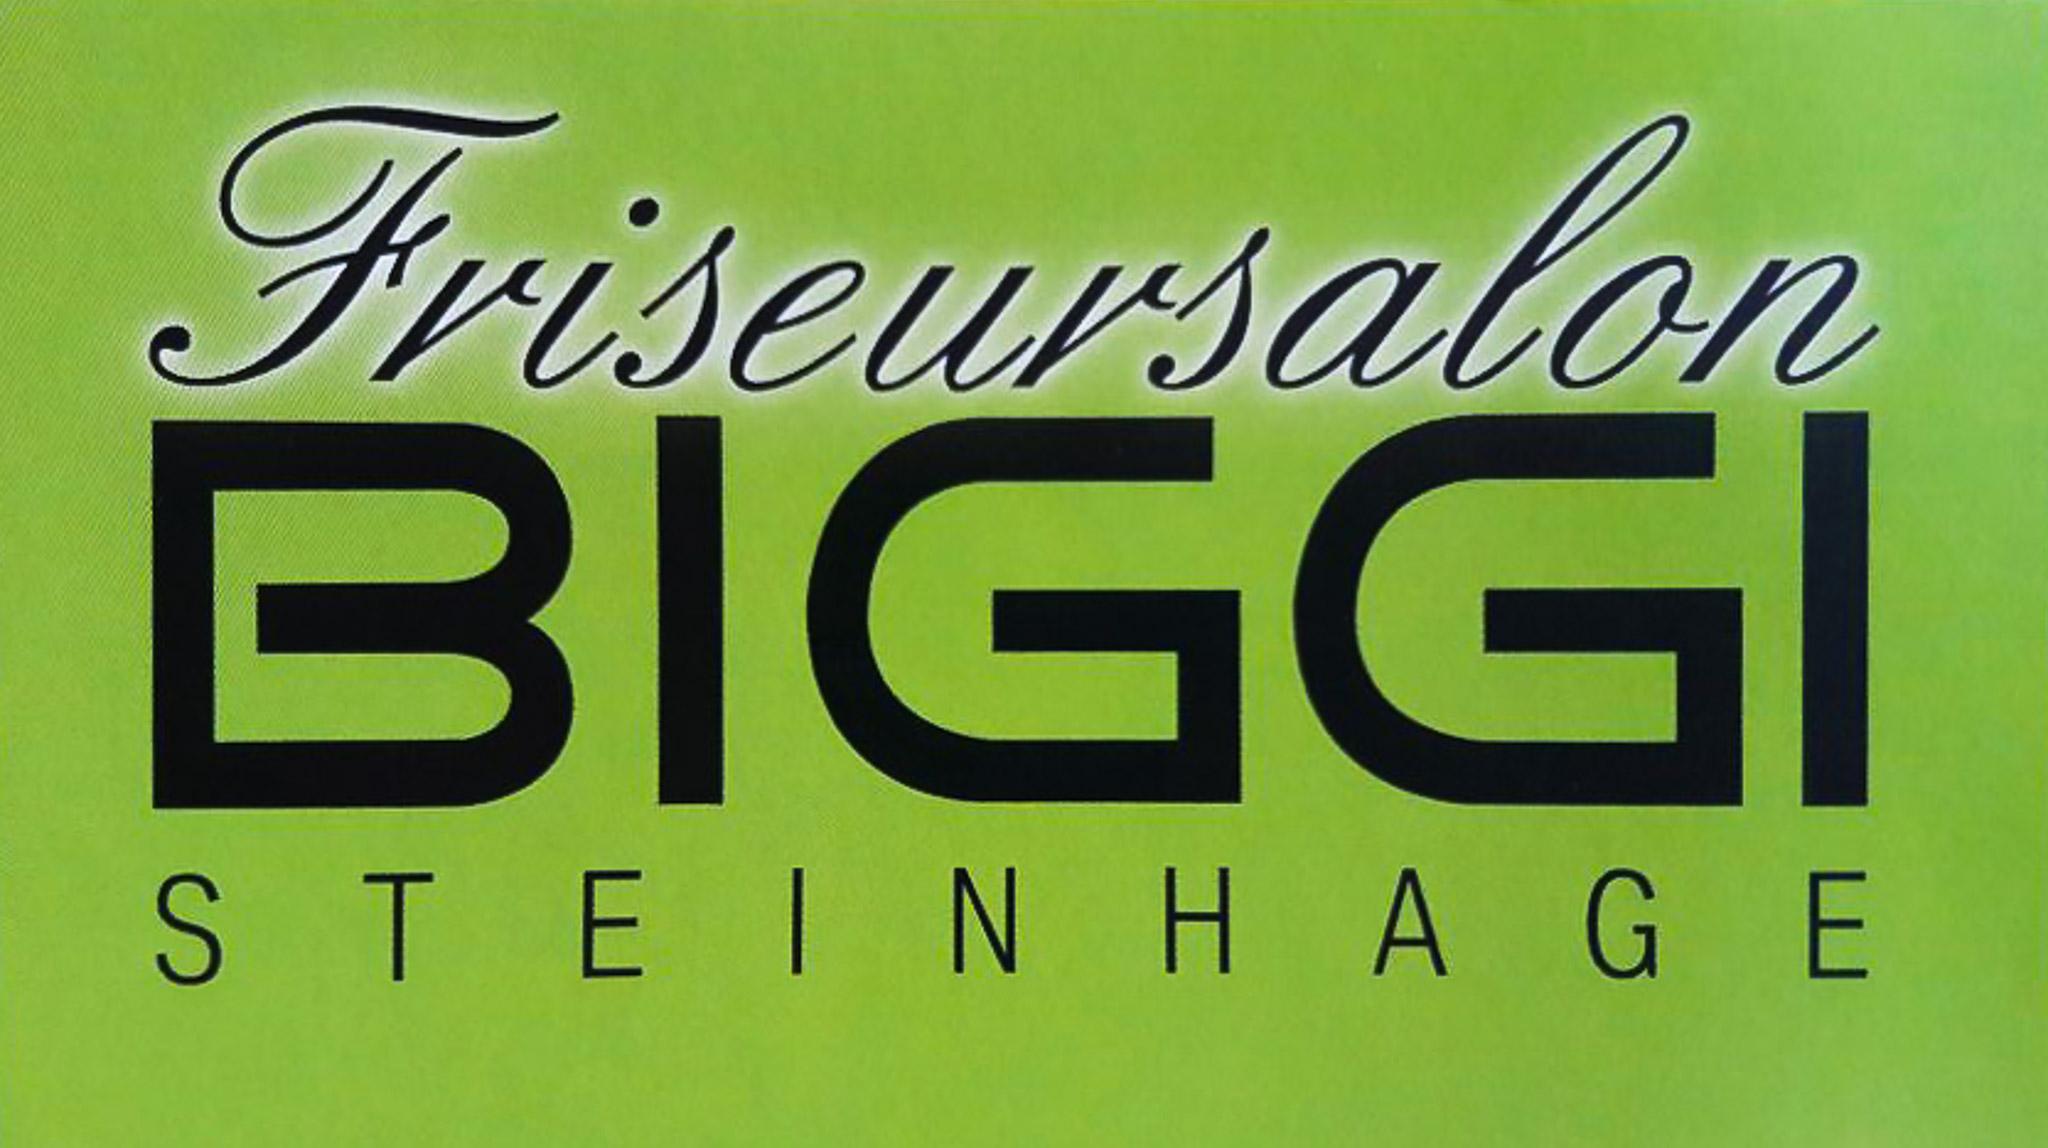 Friseursalon Biggi Steinhage